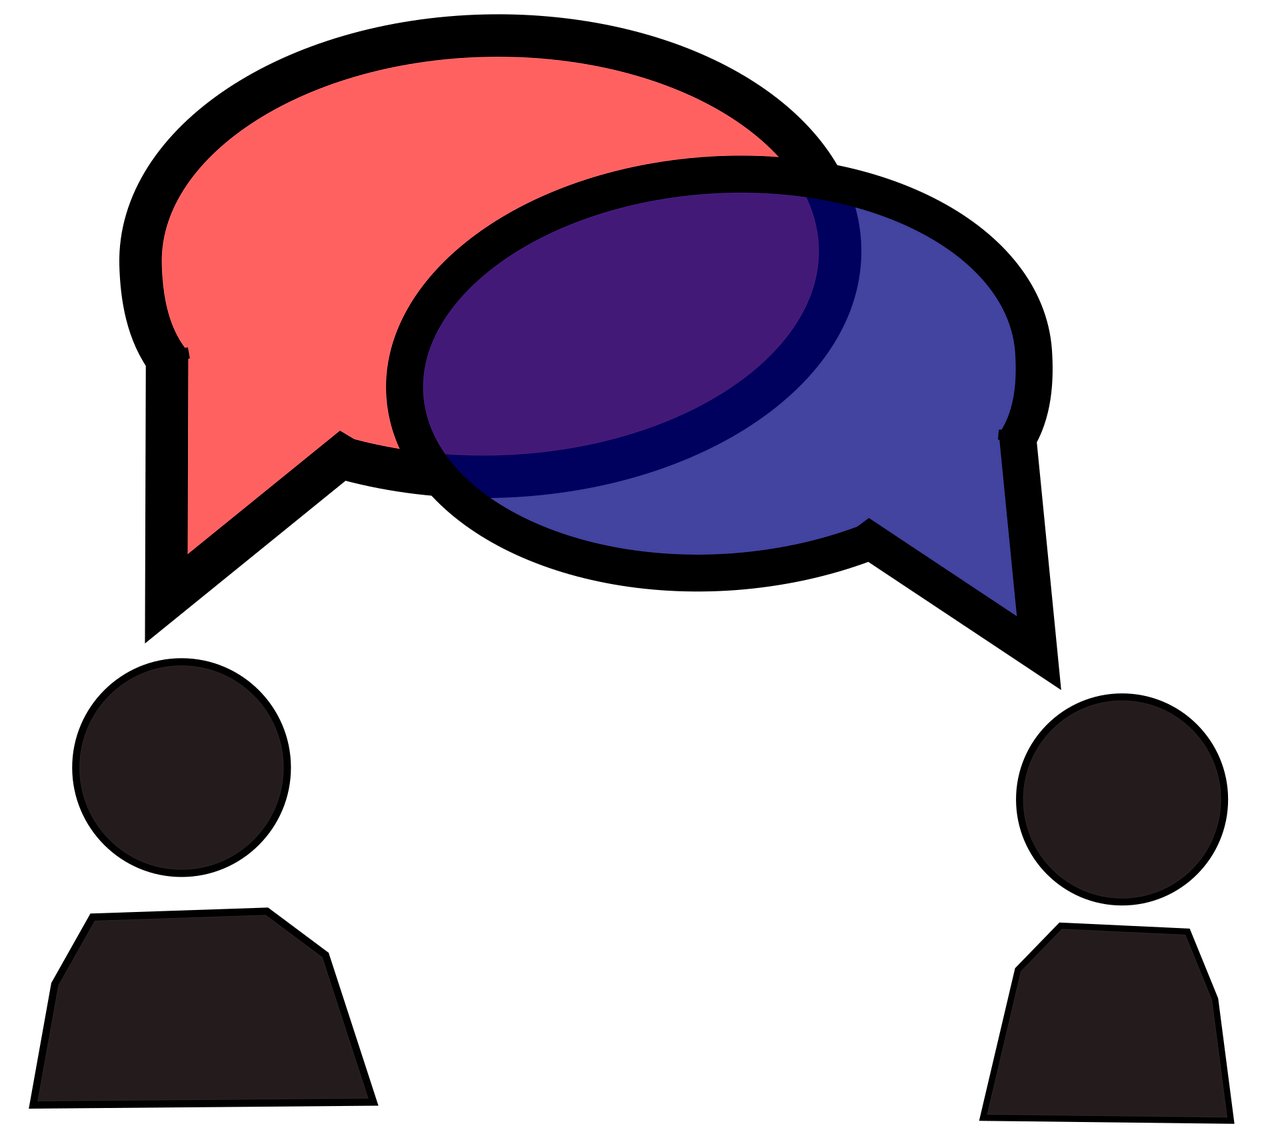 conversation dialogue interview icon communication